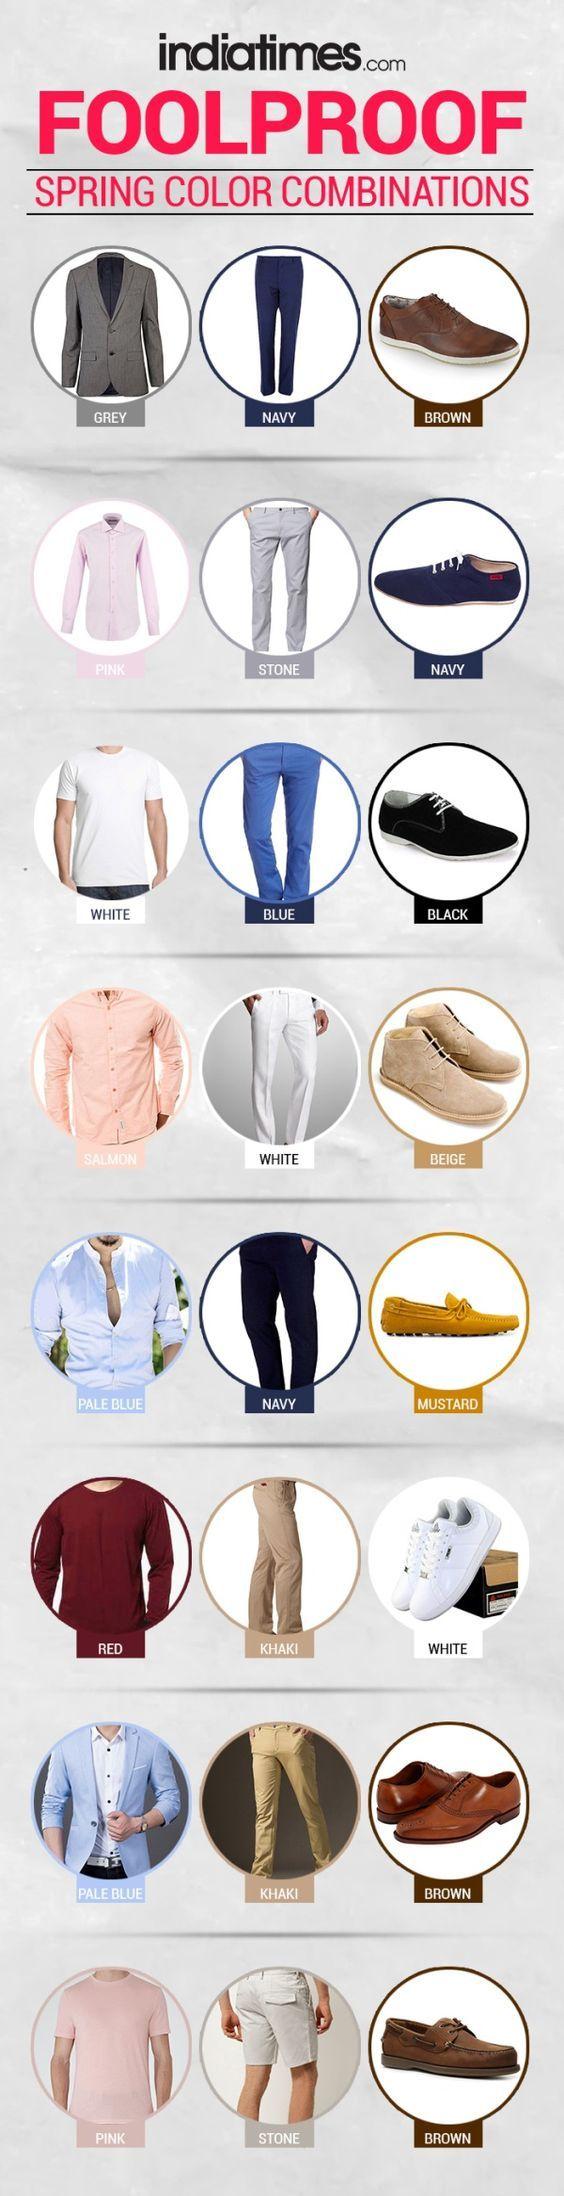 Men's fashion tip